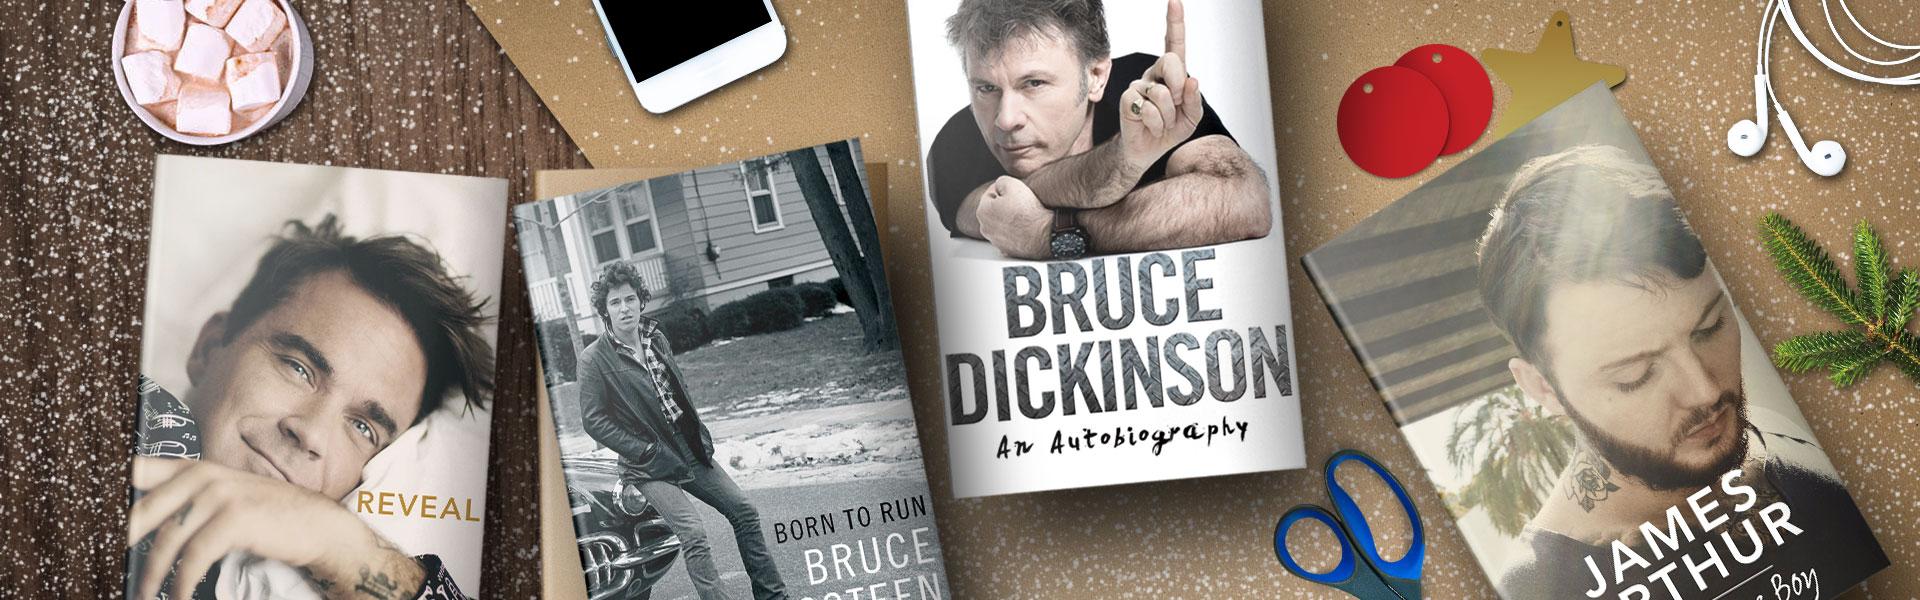 Our Christmas Top Picks: Music Books